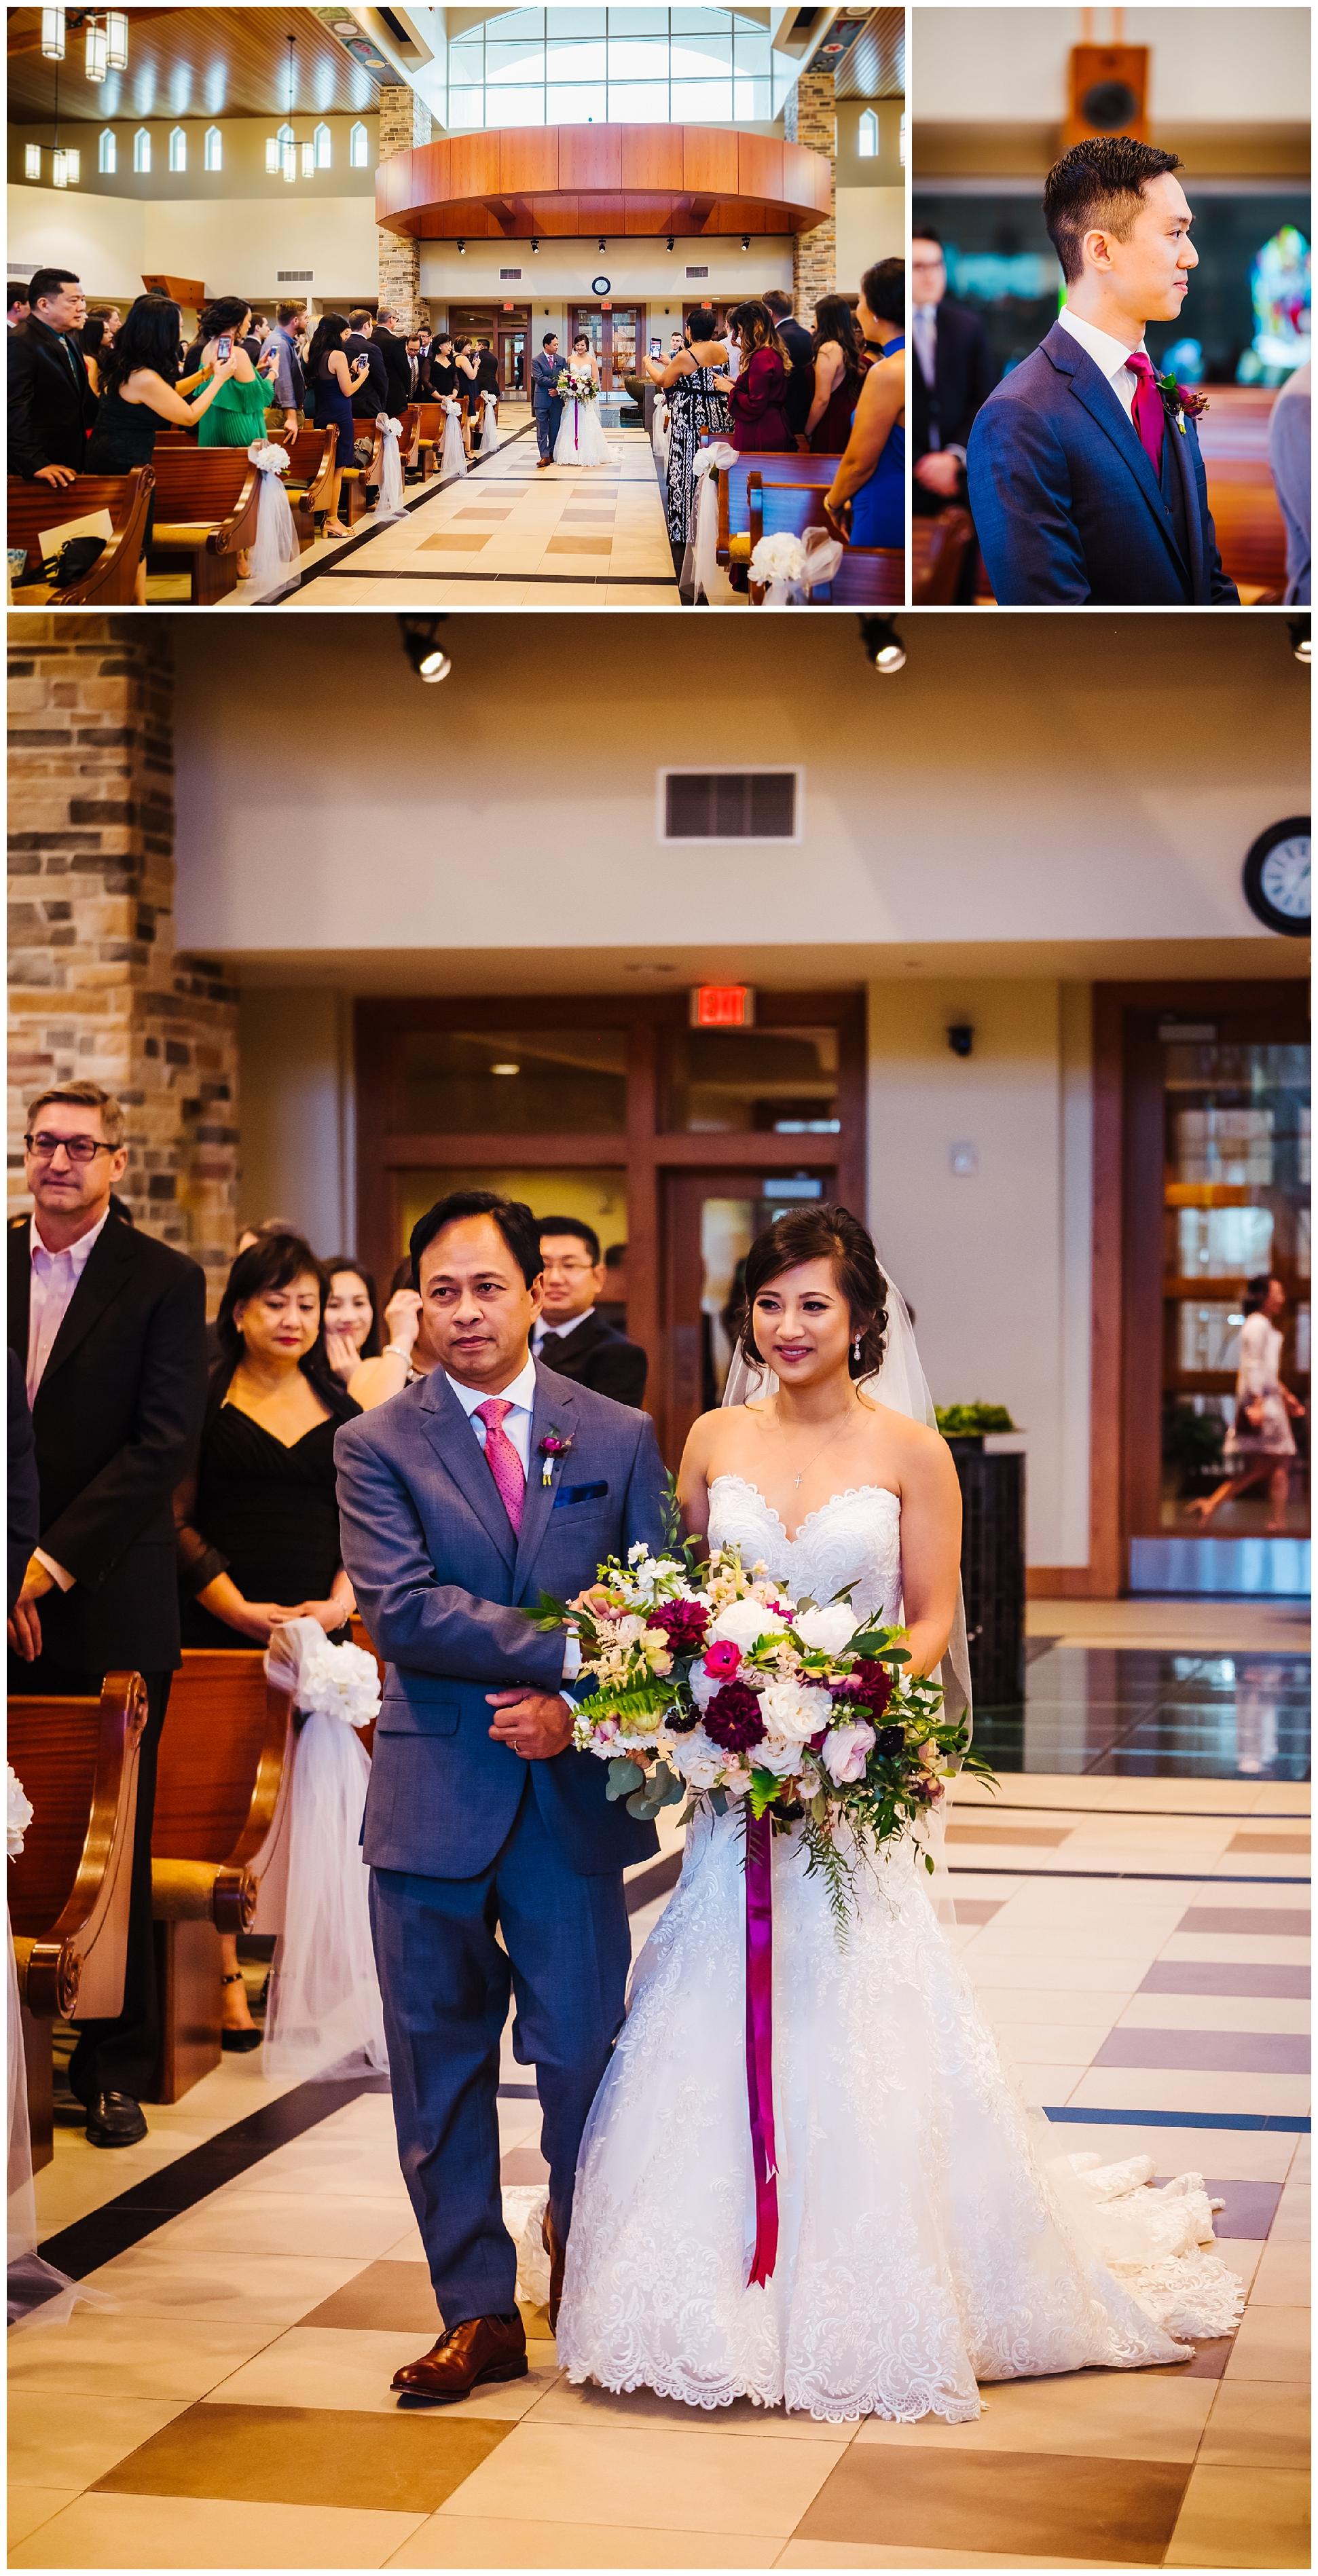 tampa-wedding-photographer-philipino-colorful-woods-ballroom-church-mass-confetti-fuscia_0029.jpg